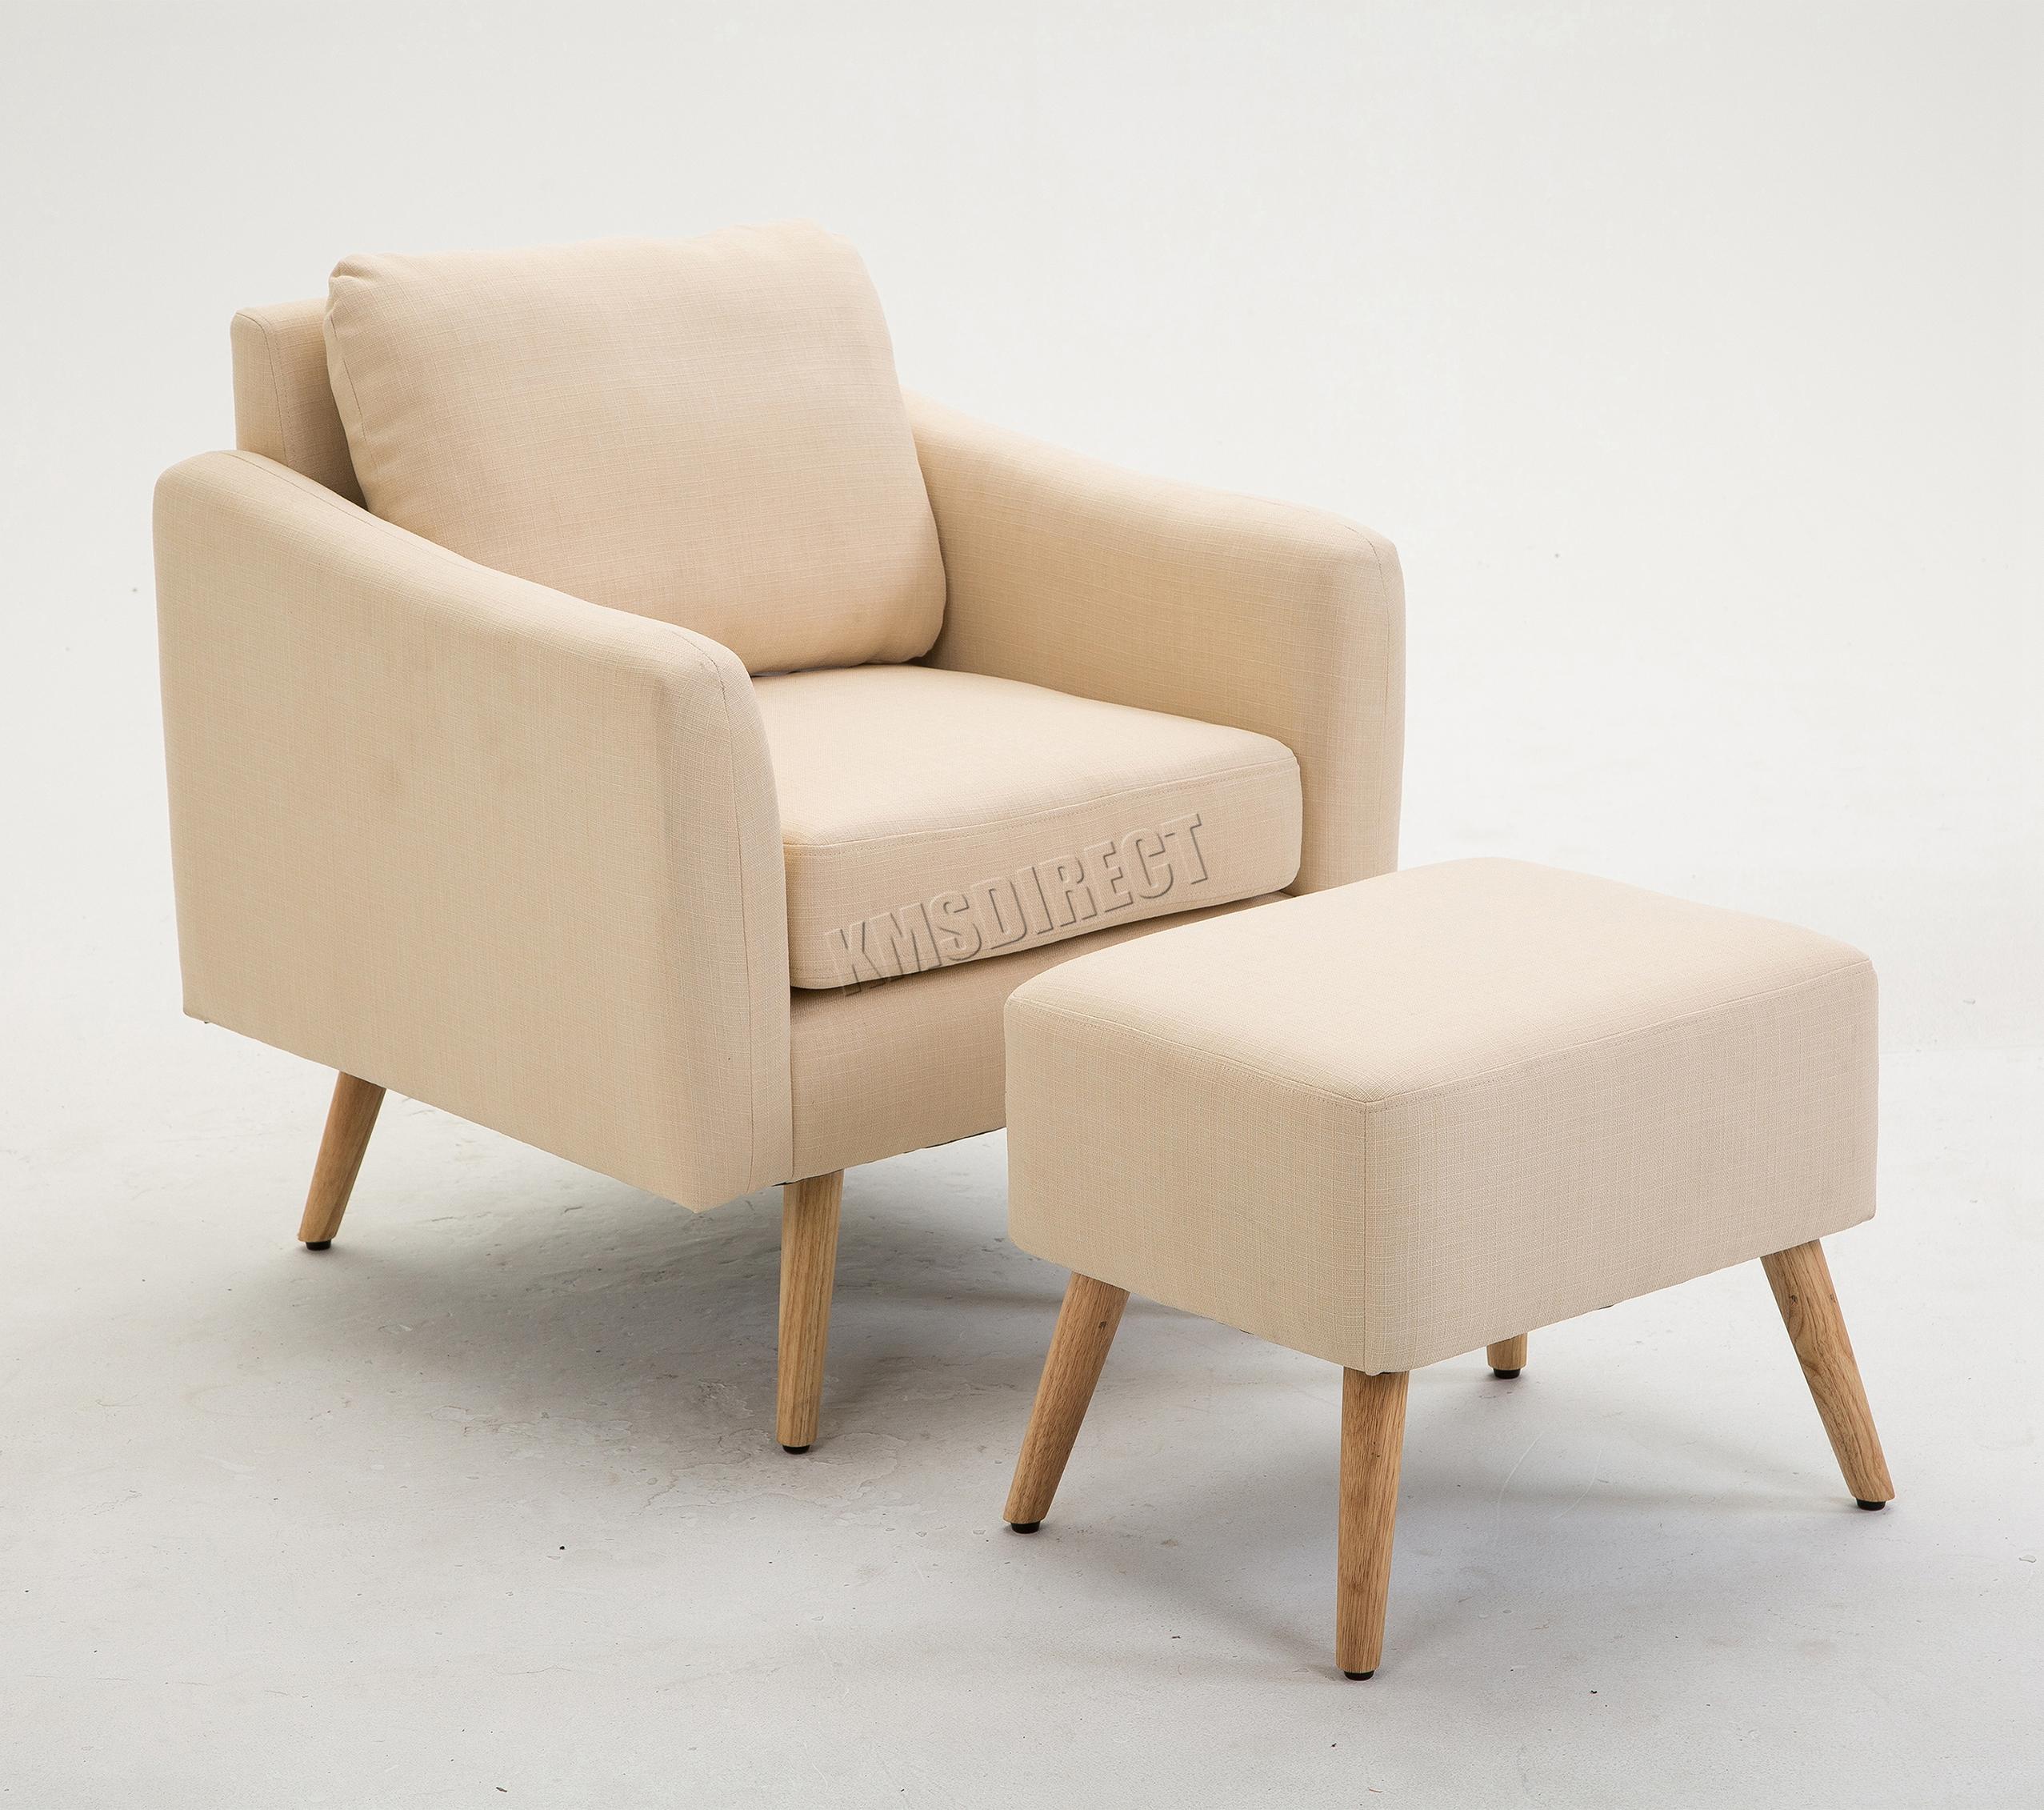 chair stool sofa macau hanging jysk foxhunter modern fabric armchair lounge tub with